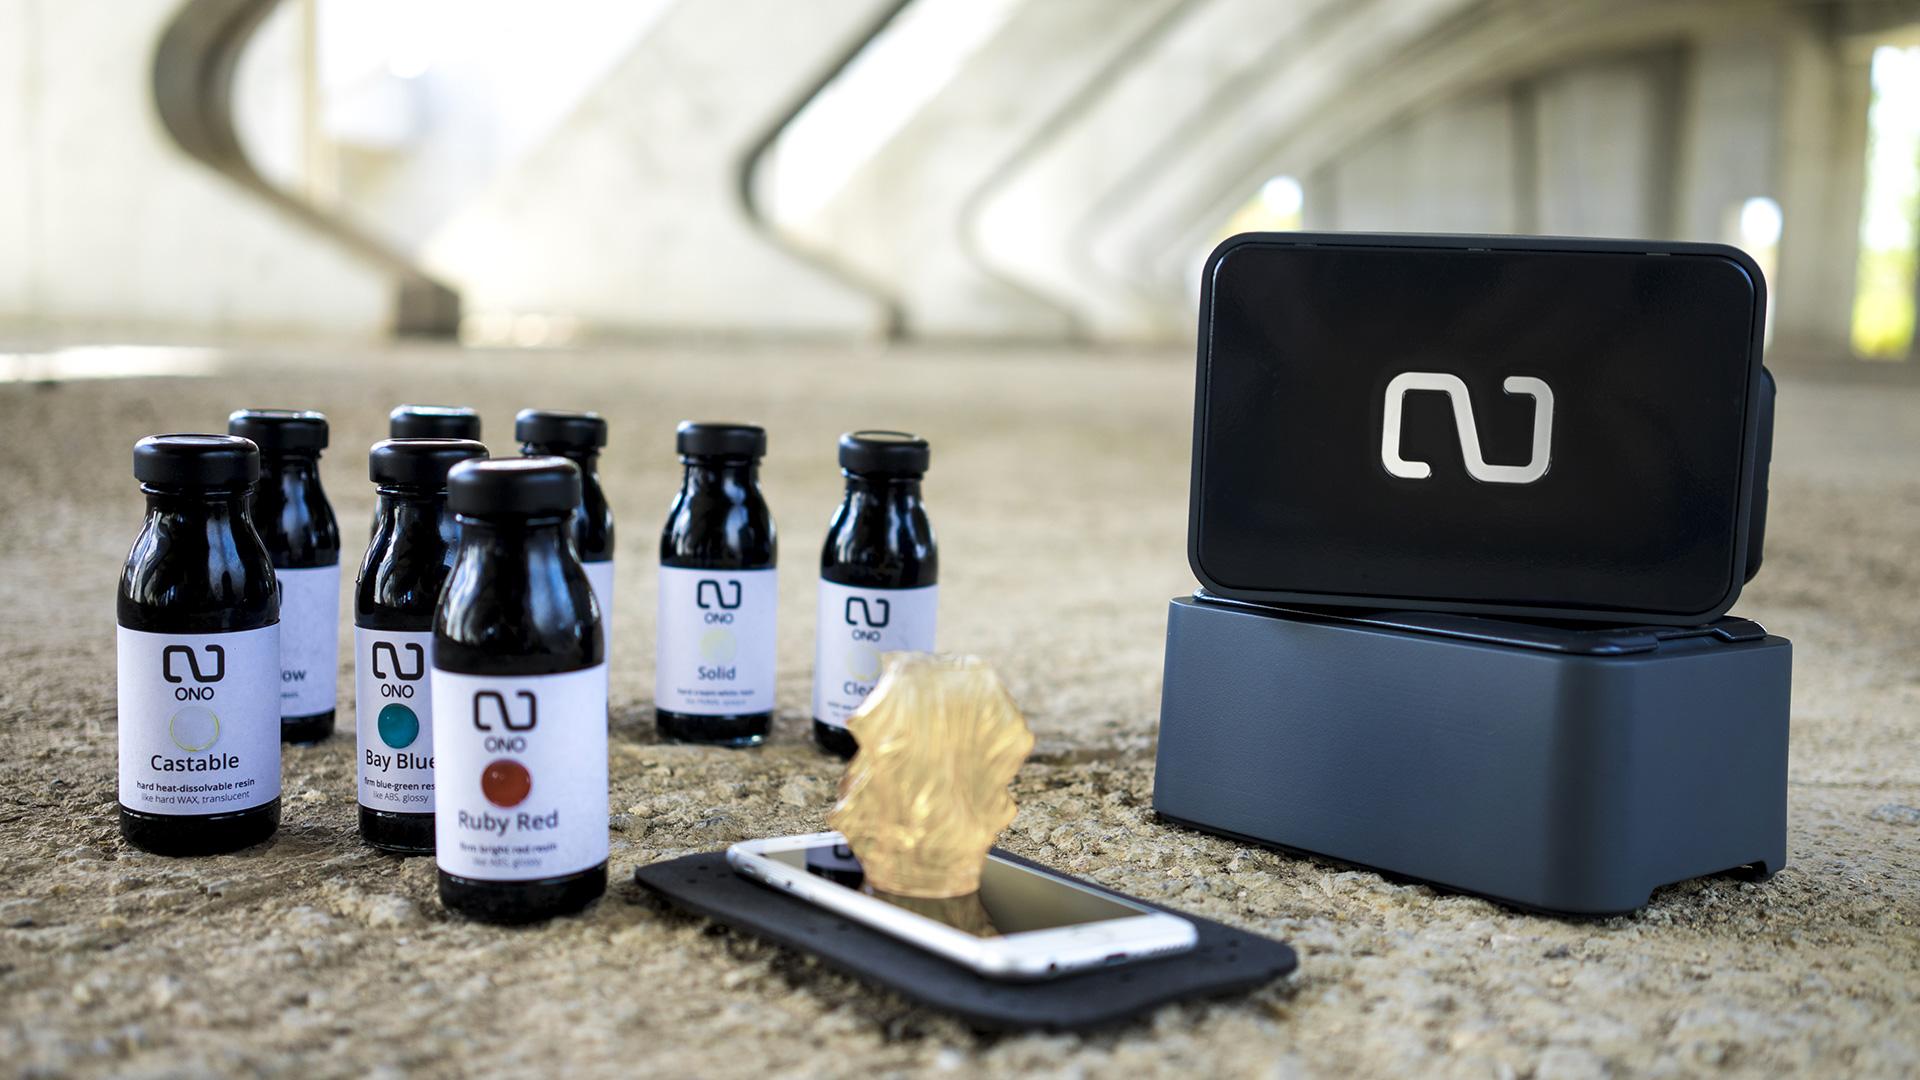 ONO, $99 Smartphone-Powered 3D Printer